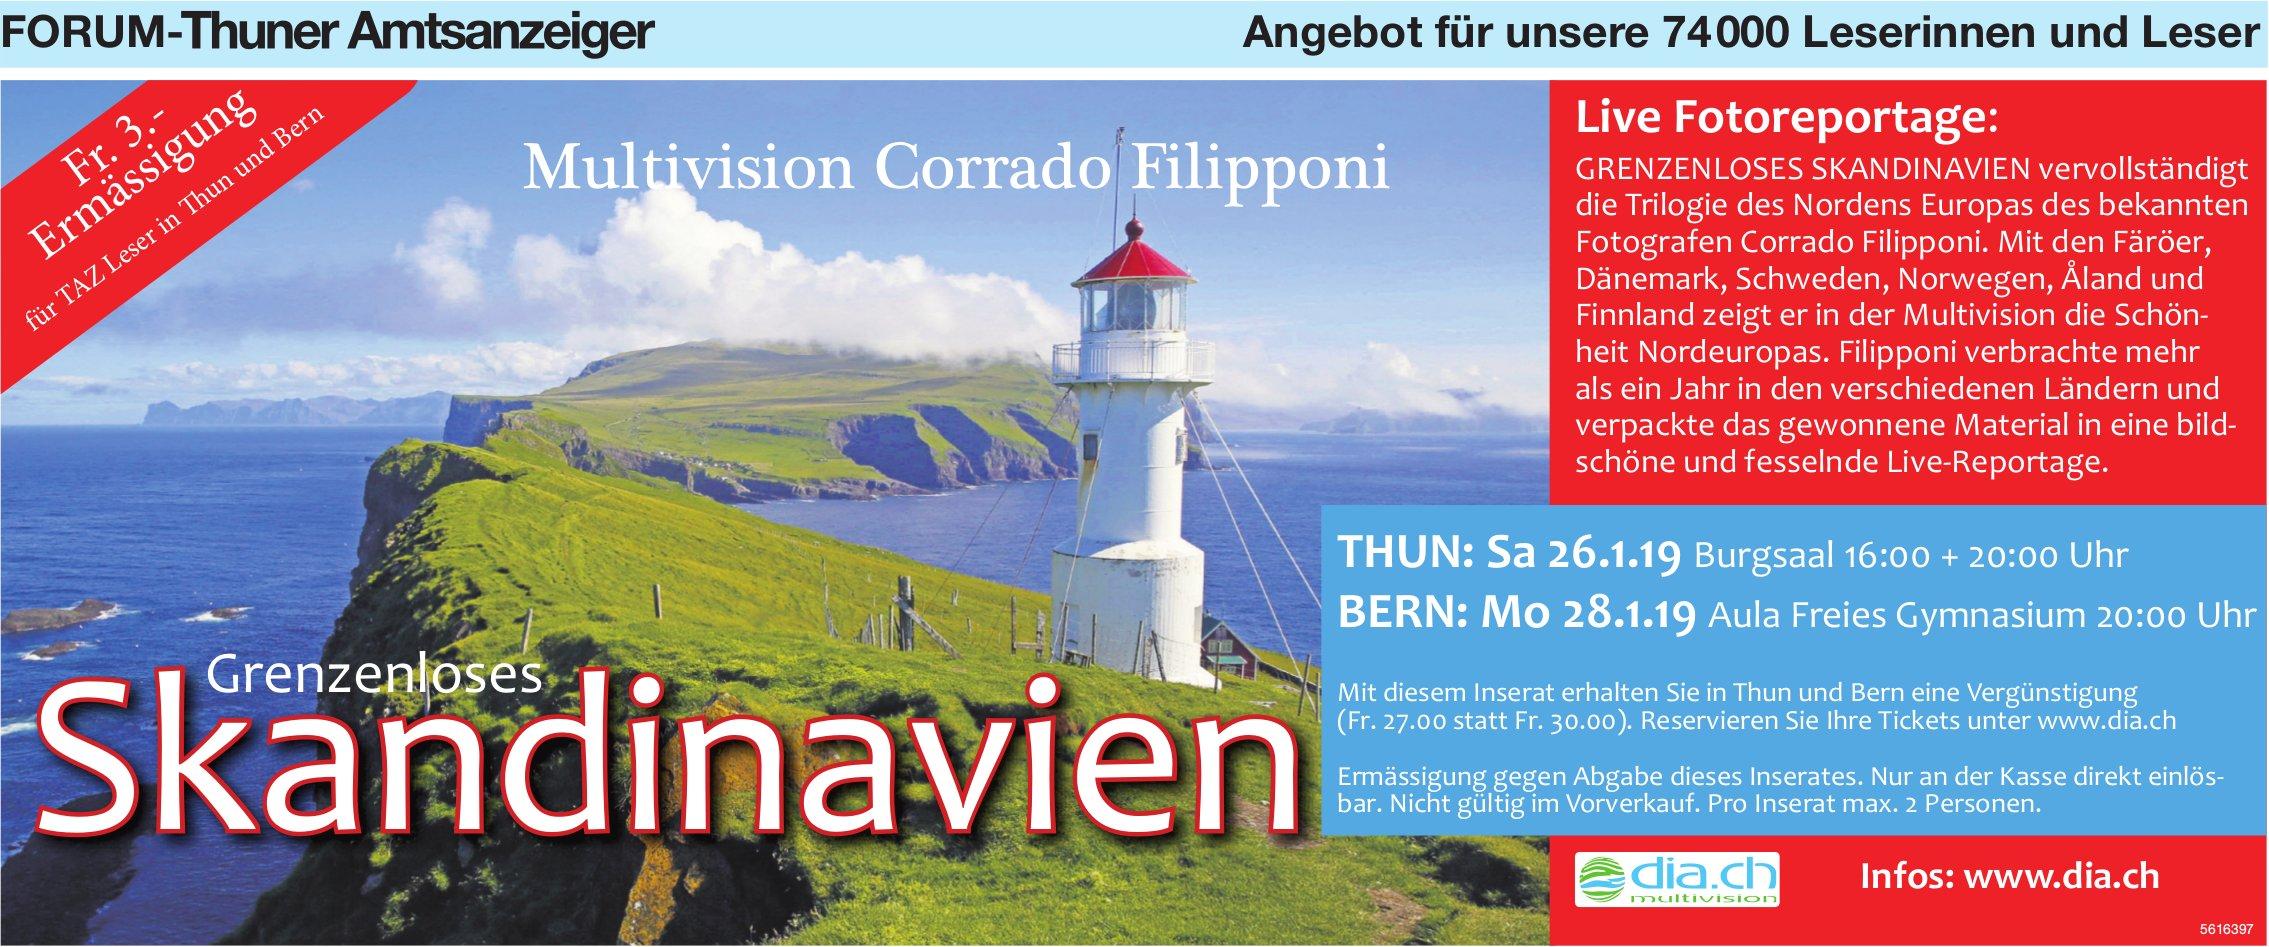 Forum-Thuner Amtsanzeiger - Grenzenloses Skandinavien, Live Fotoreportage, 26. + 28. Januar